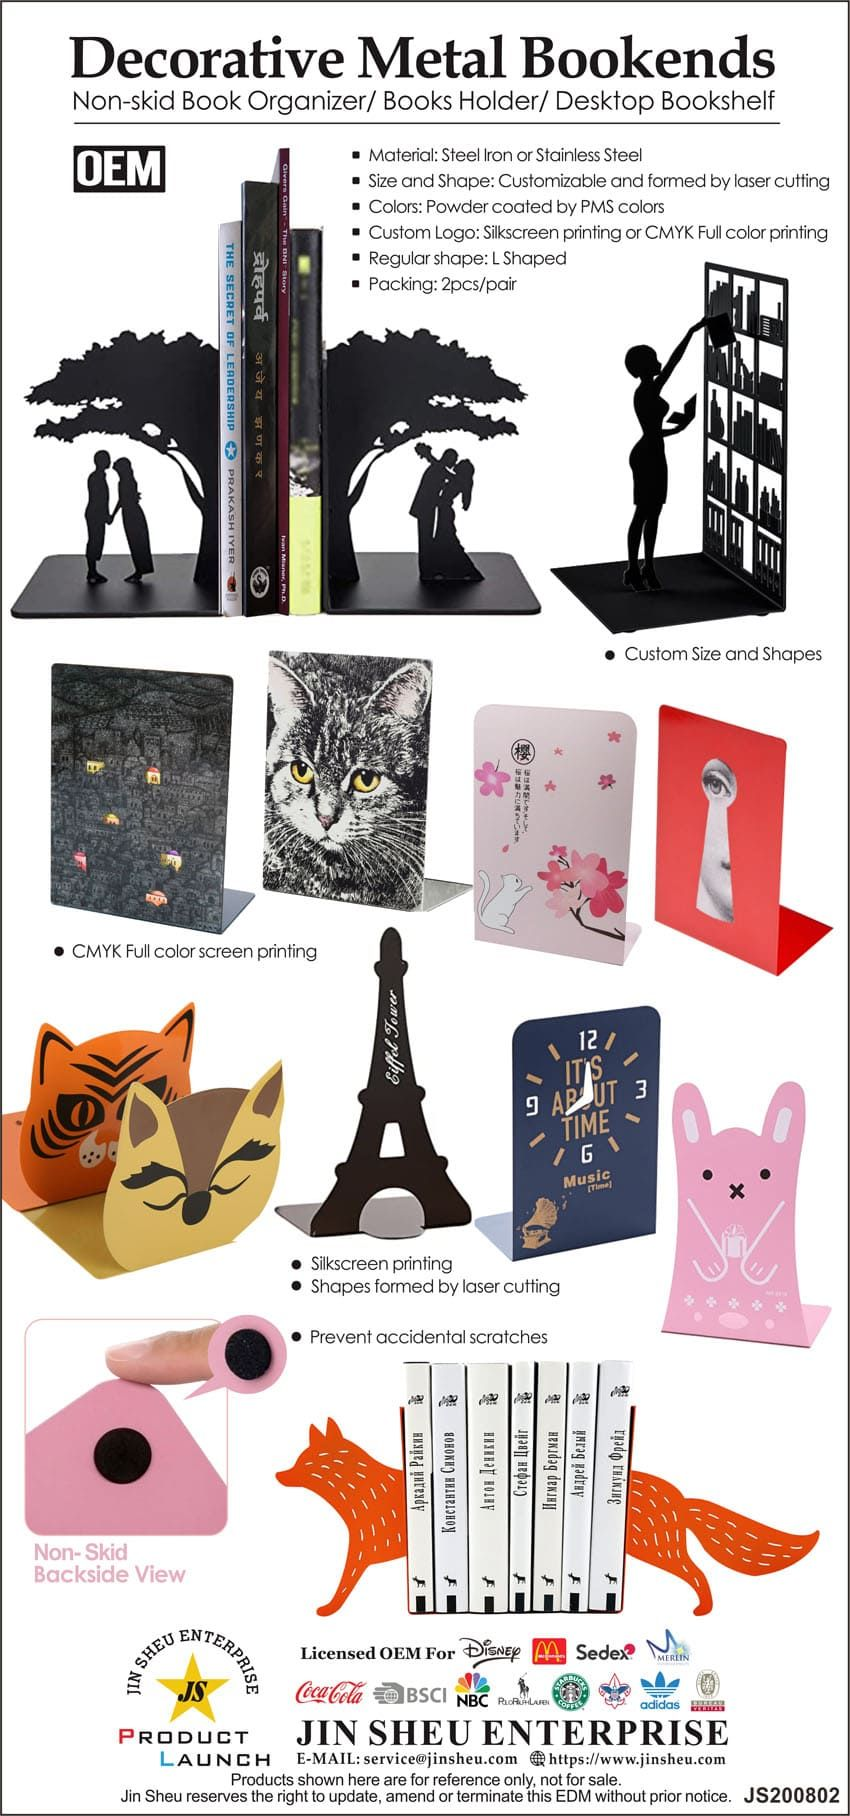 Decorative Metal Bookends